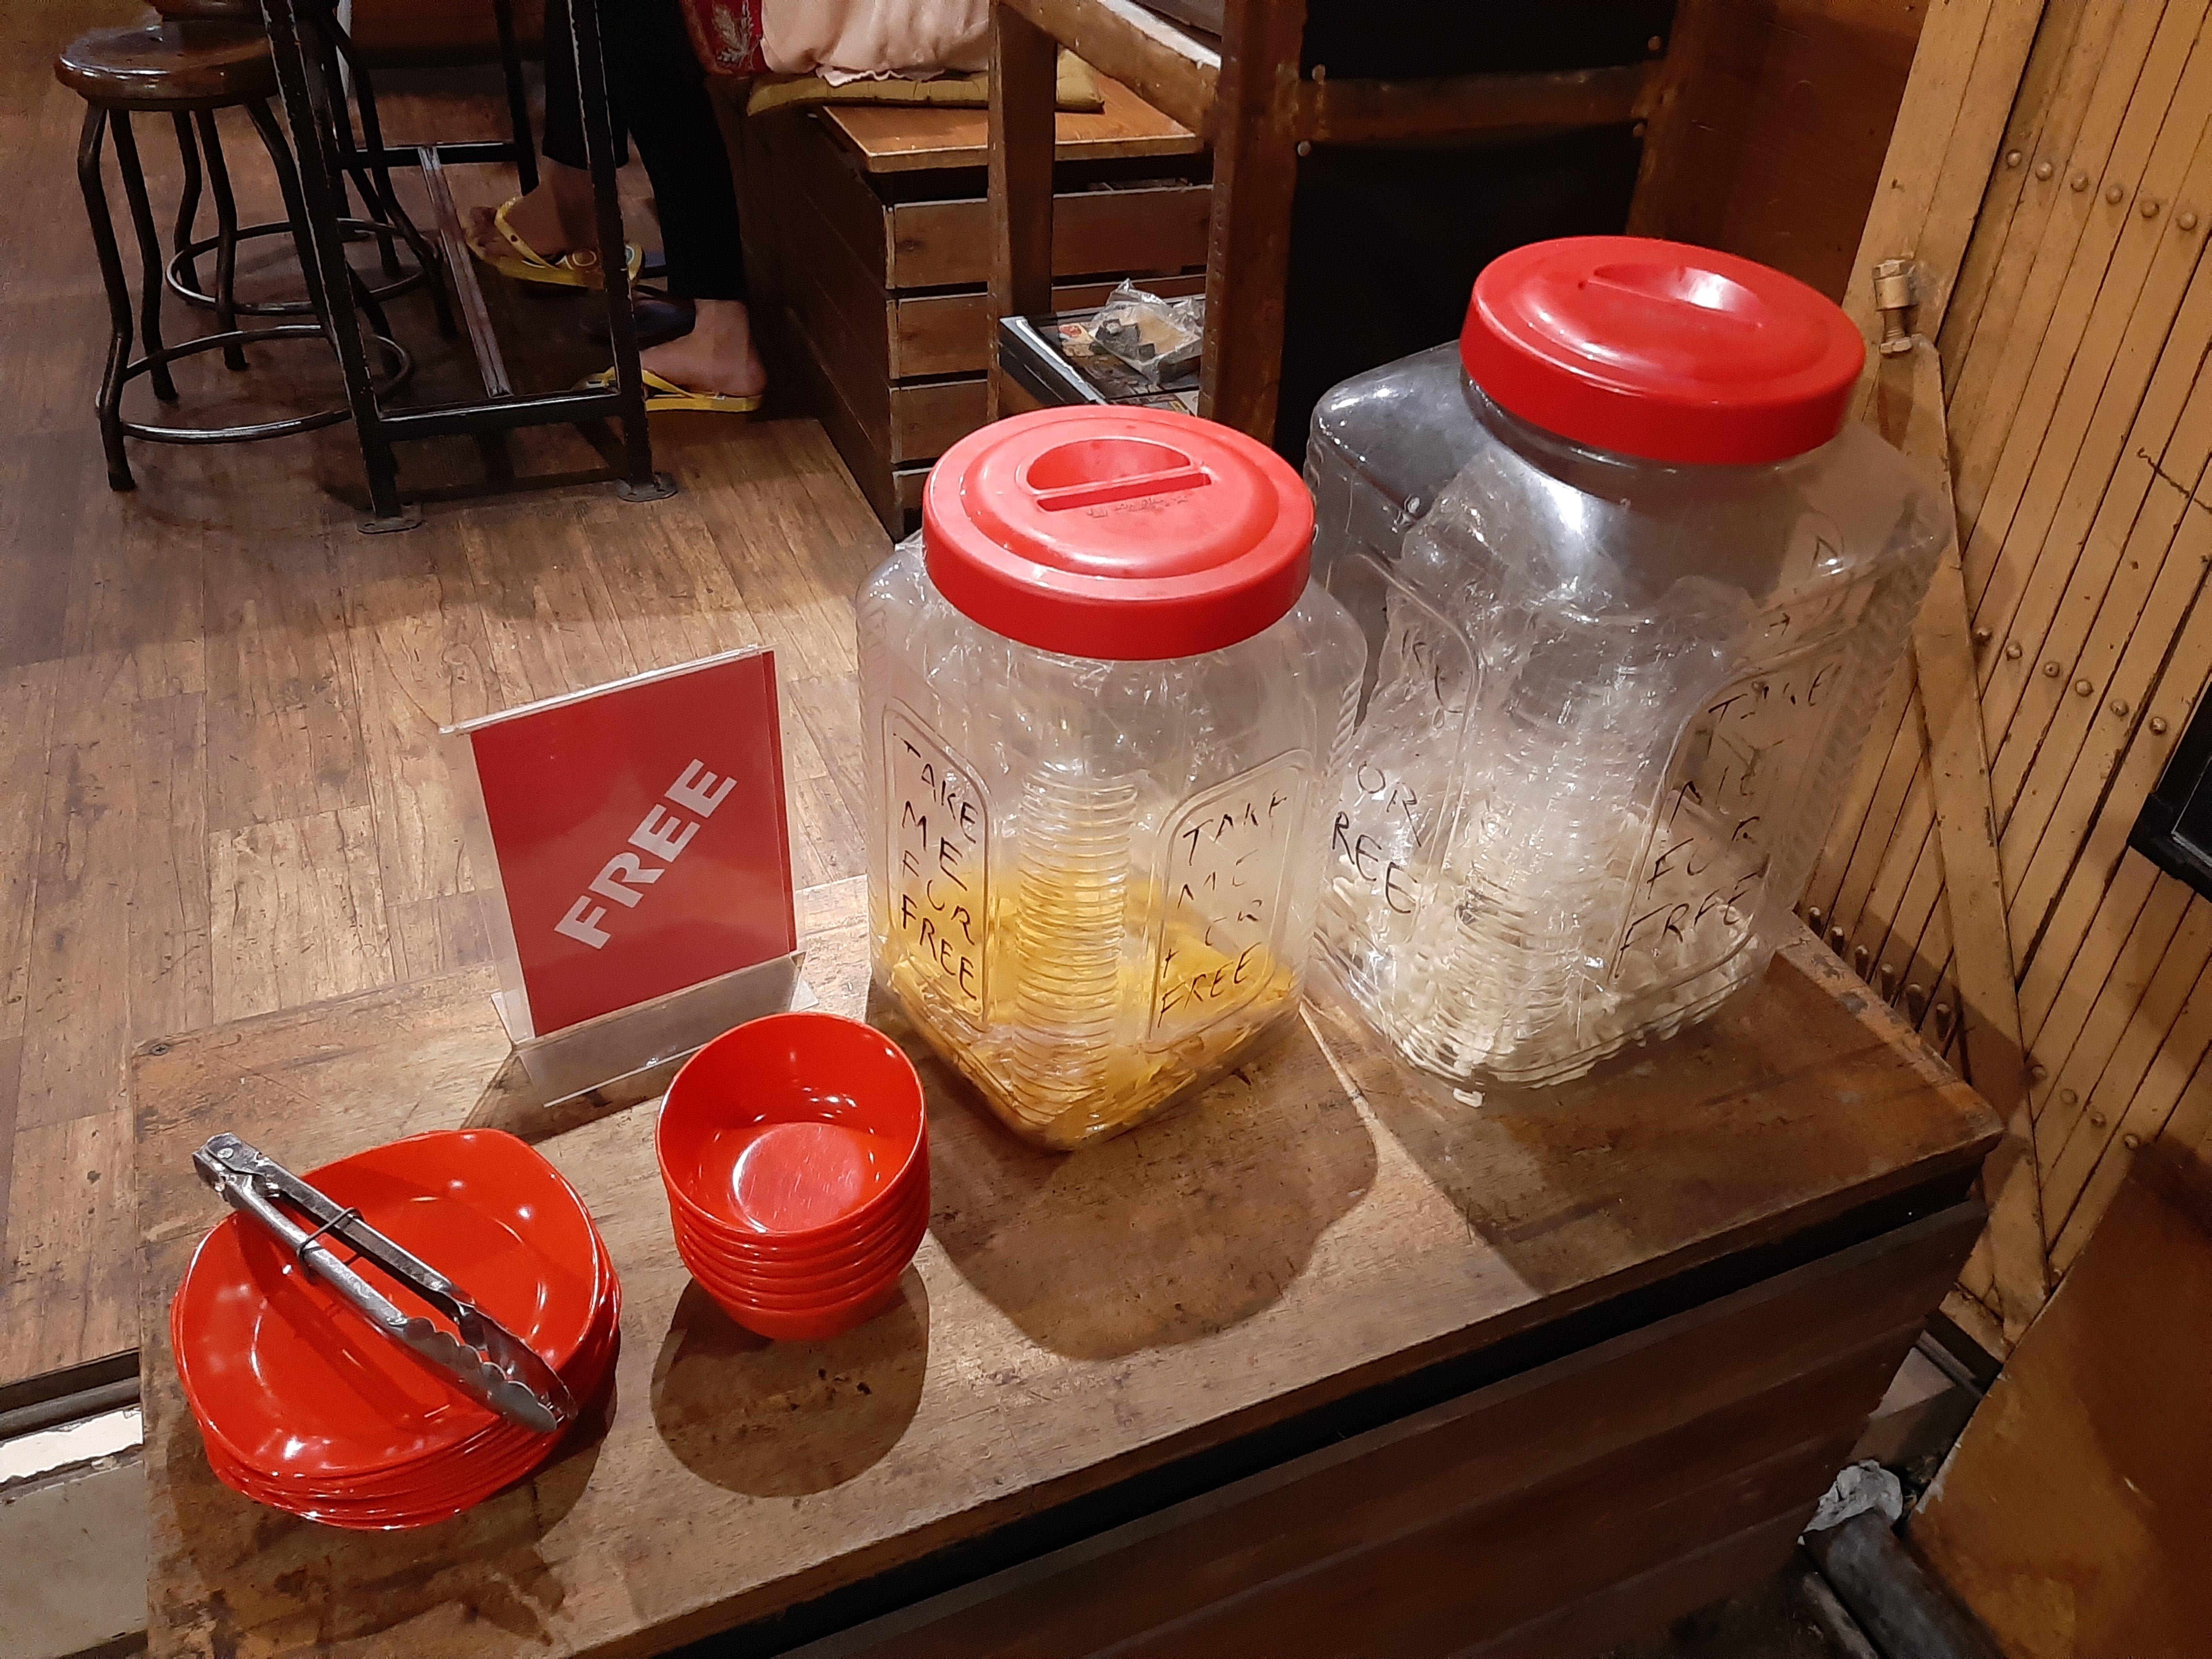 Free snacks at Danke Cafe, Tabanan